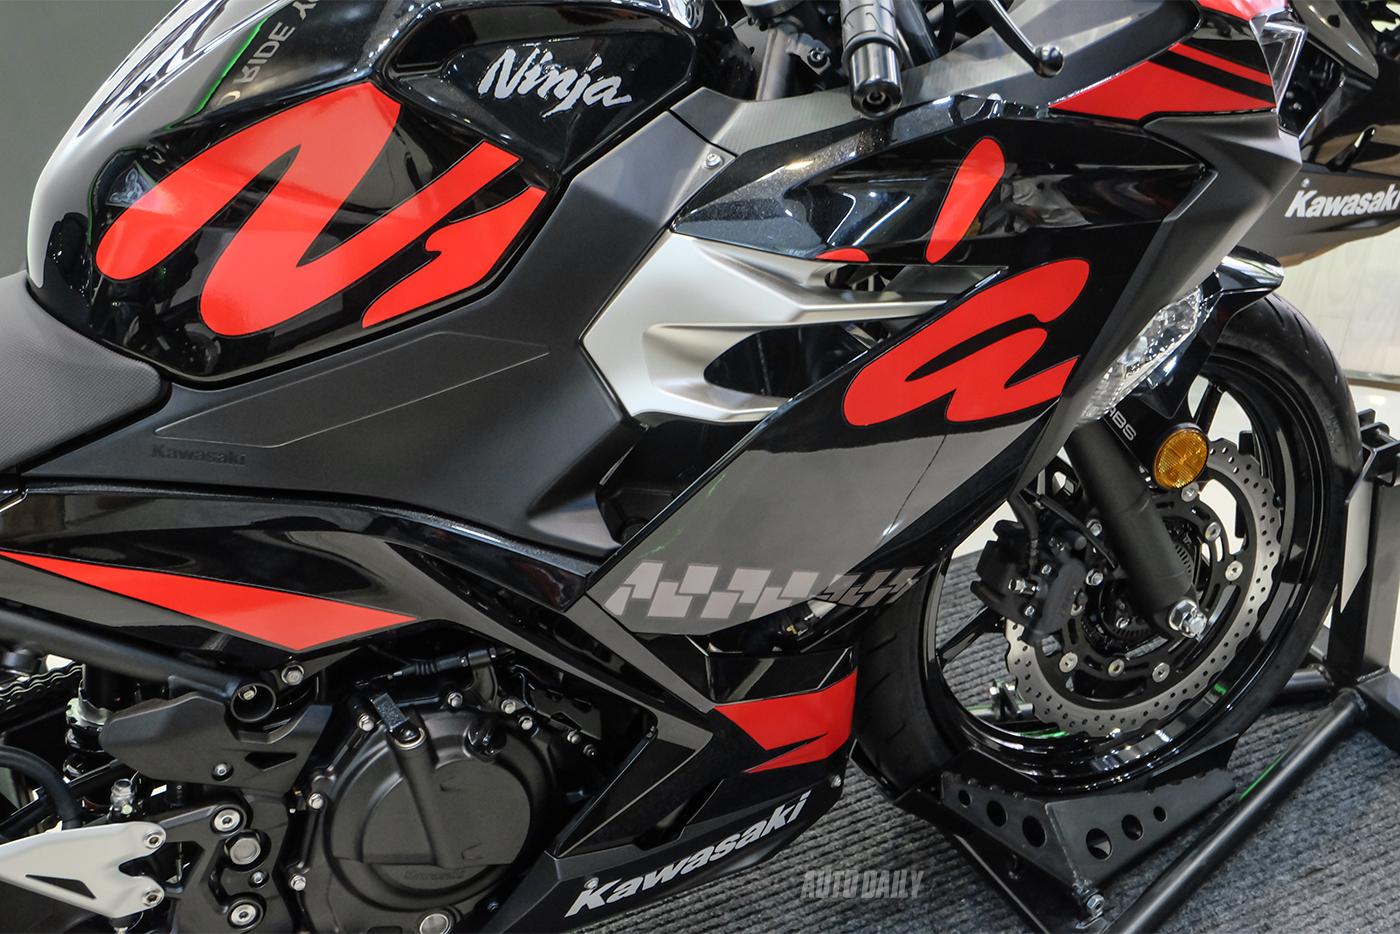 kawasaki-ninja-400-14.jpg